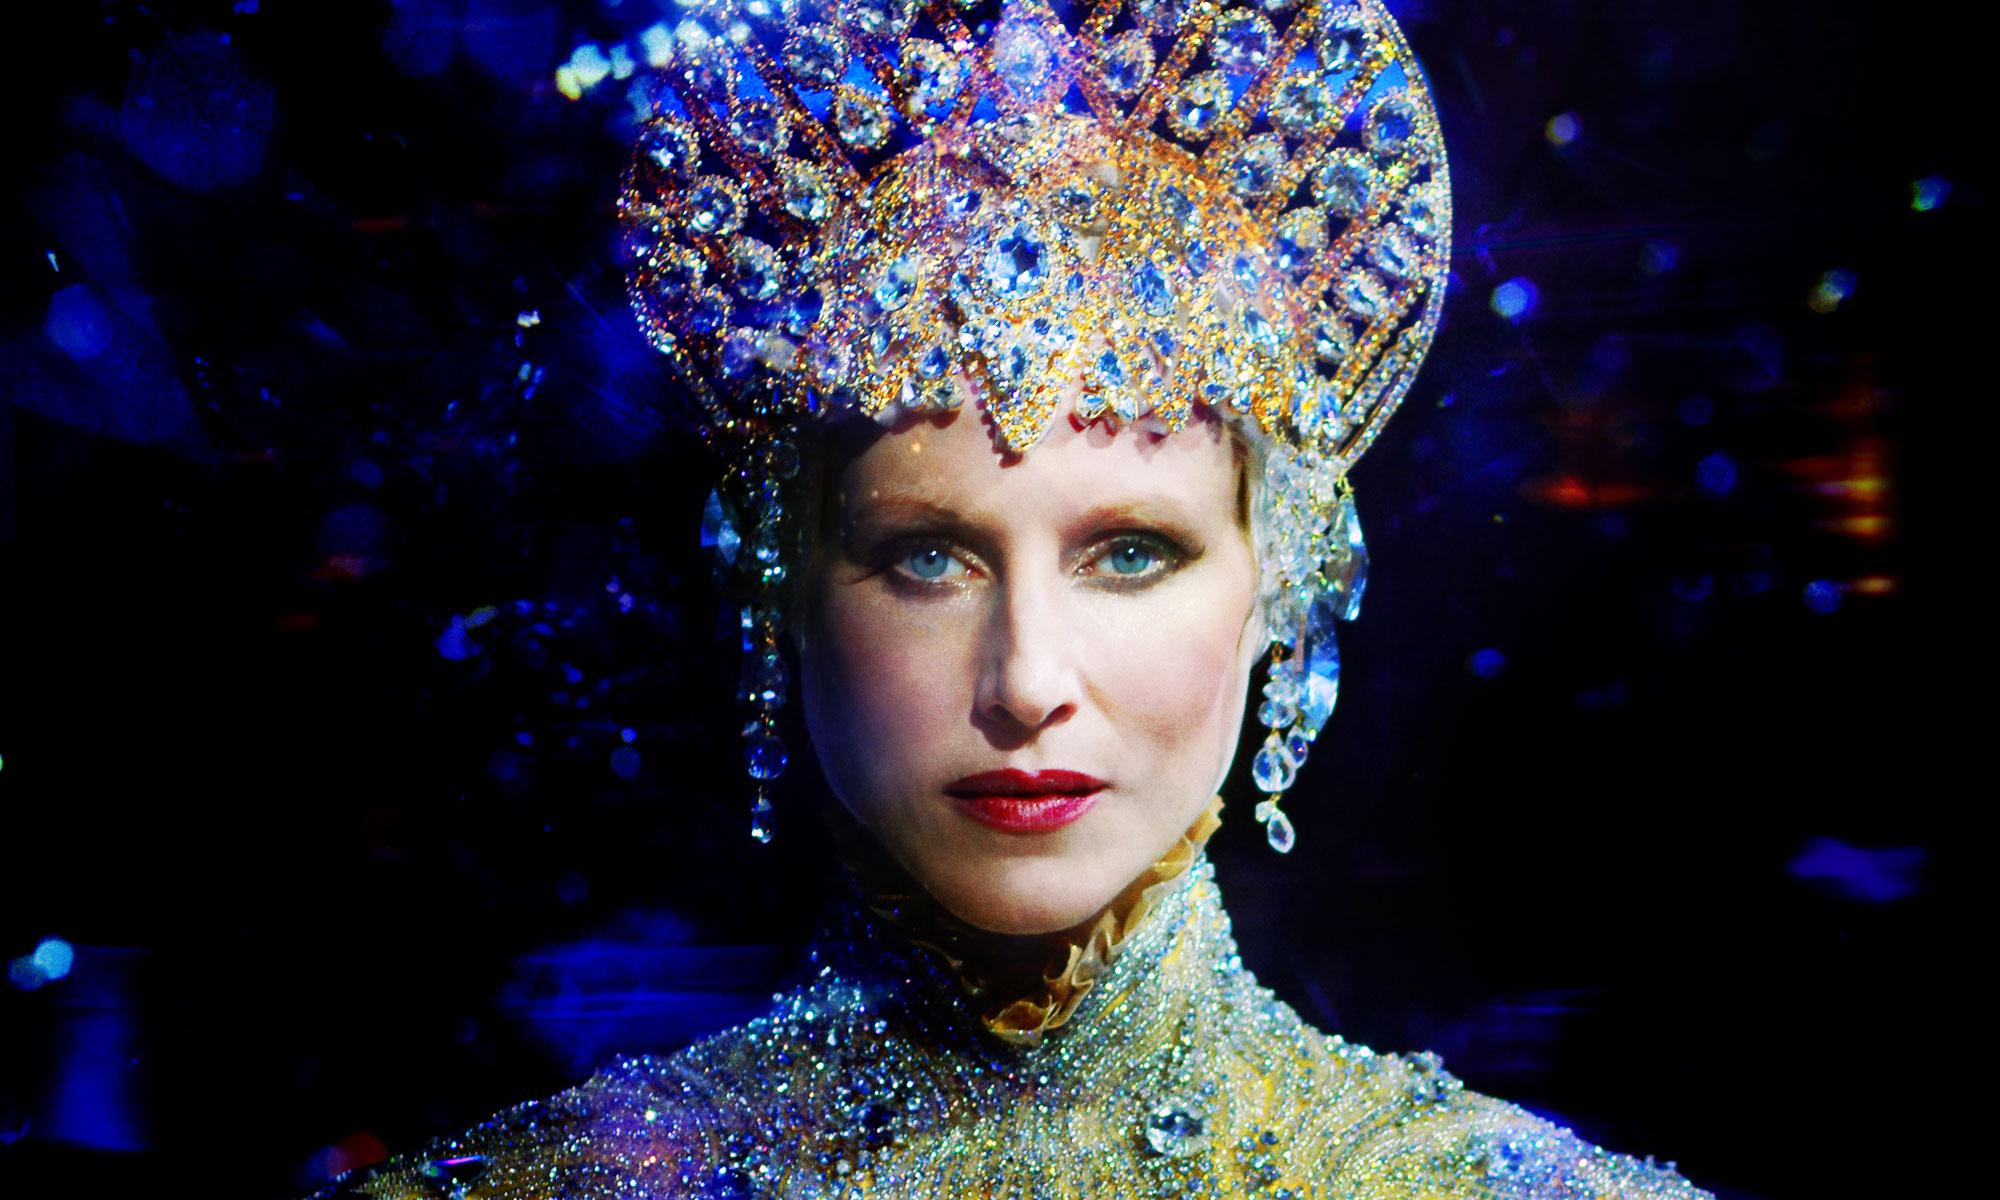 Giovanna-Battaglia-Queen-Of-The-Night-013.jpg